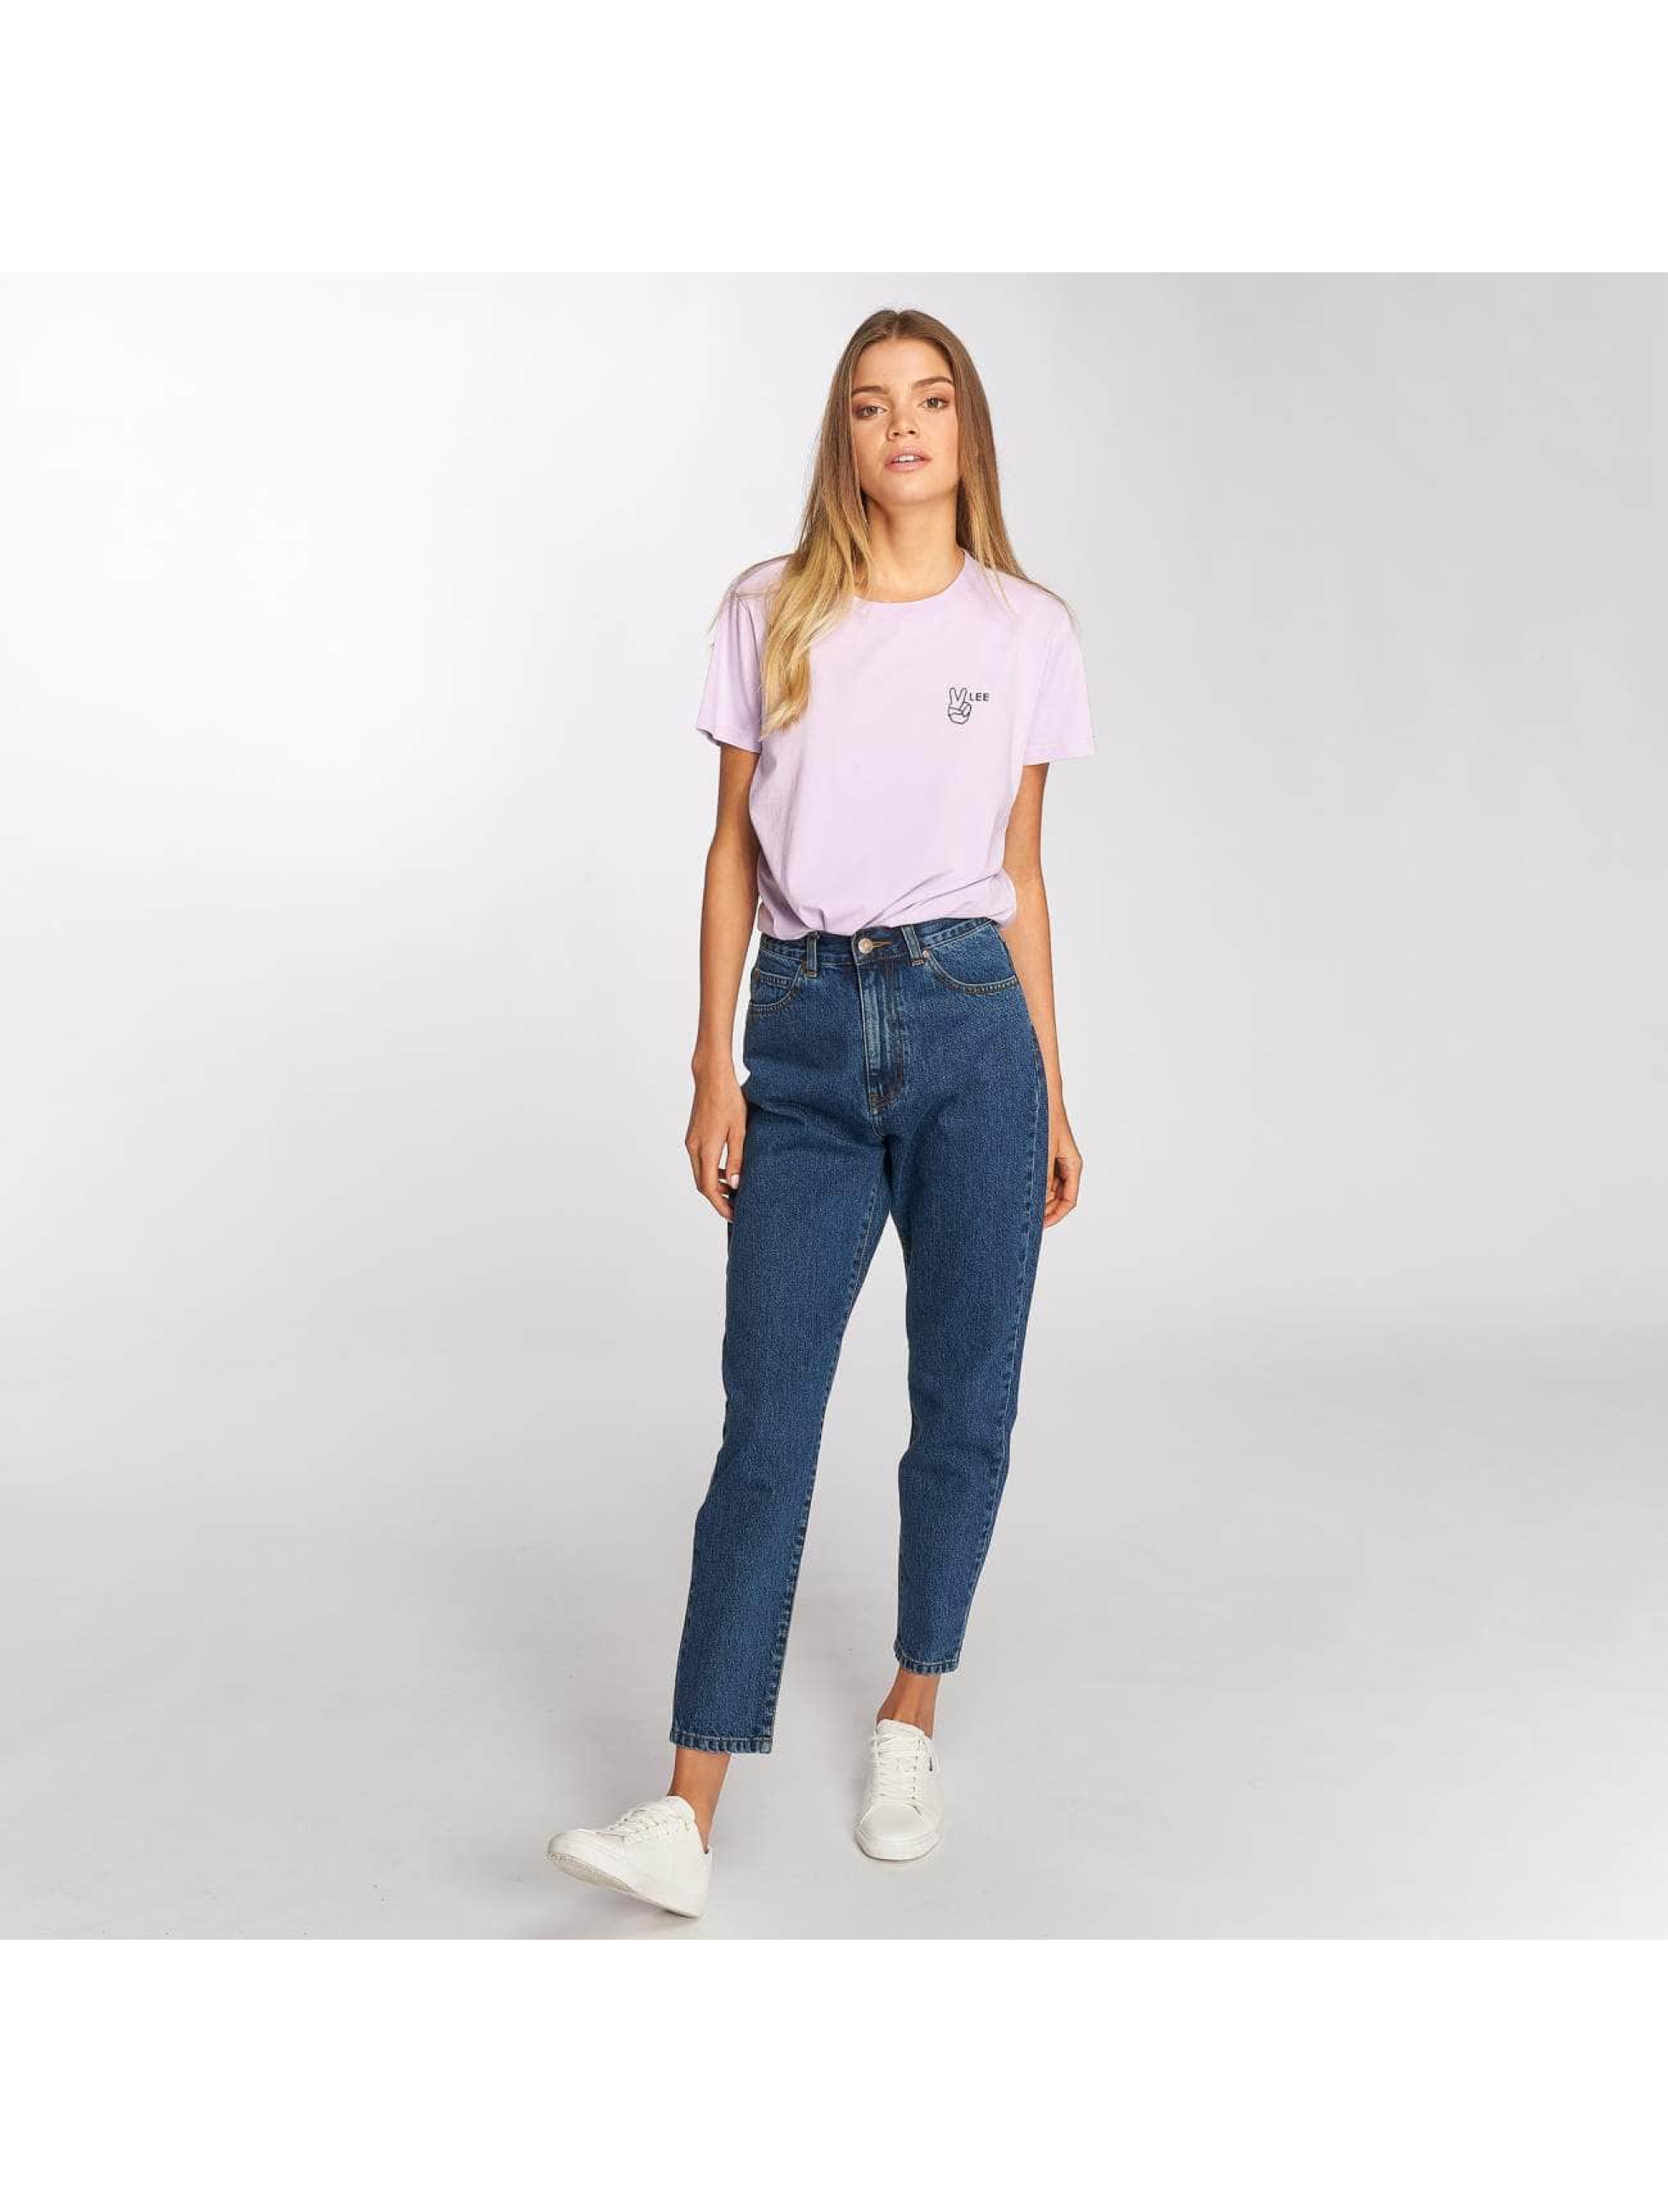 Lee T-Shirt Walte pourpre